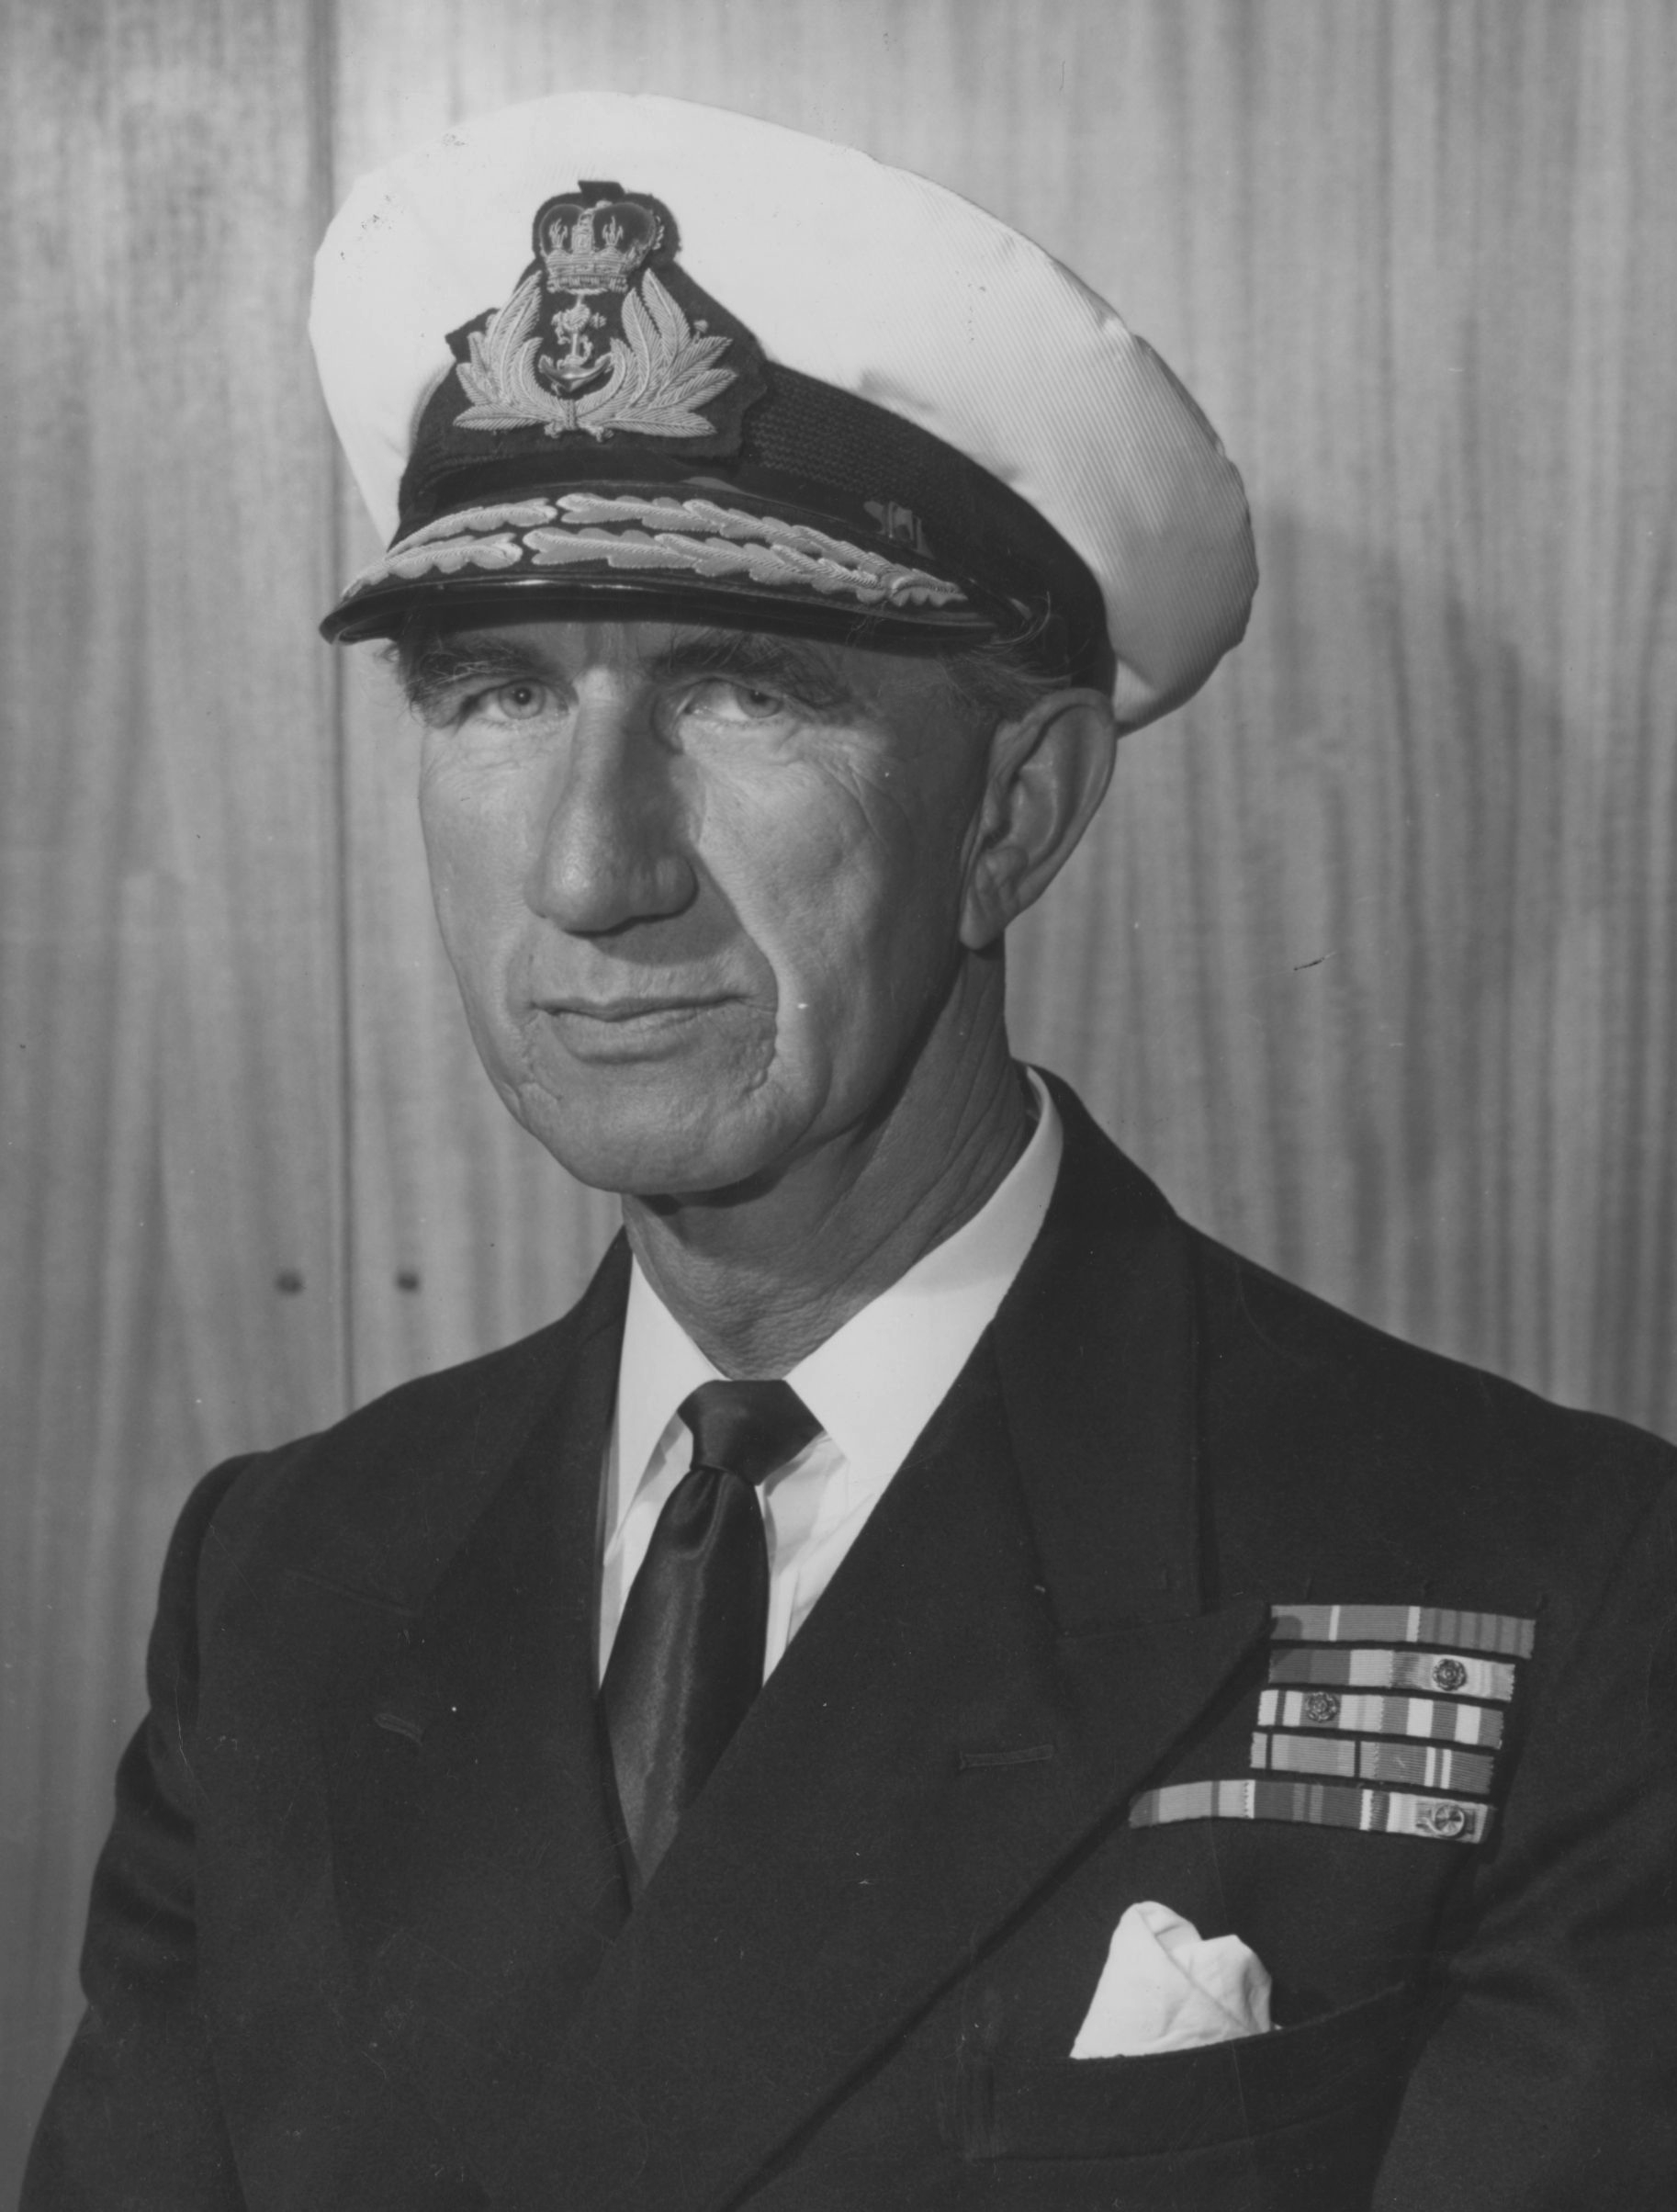 VADM Sir Alan Wedel Ramsay McNicoll